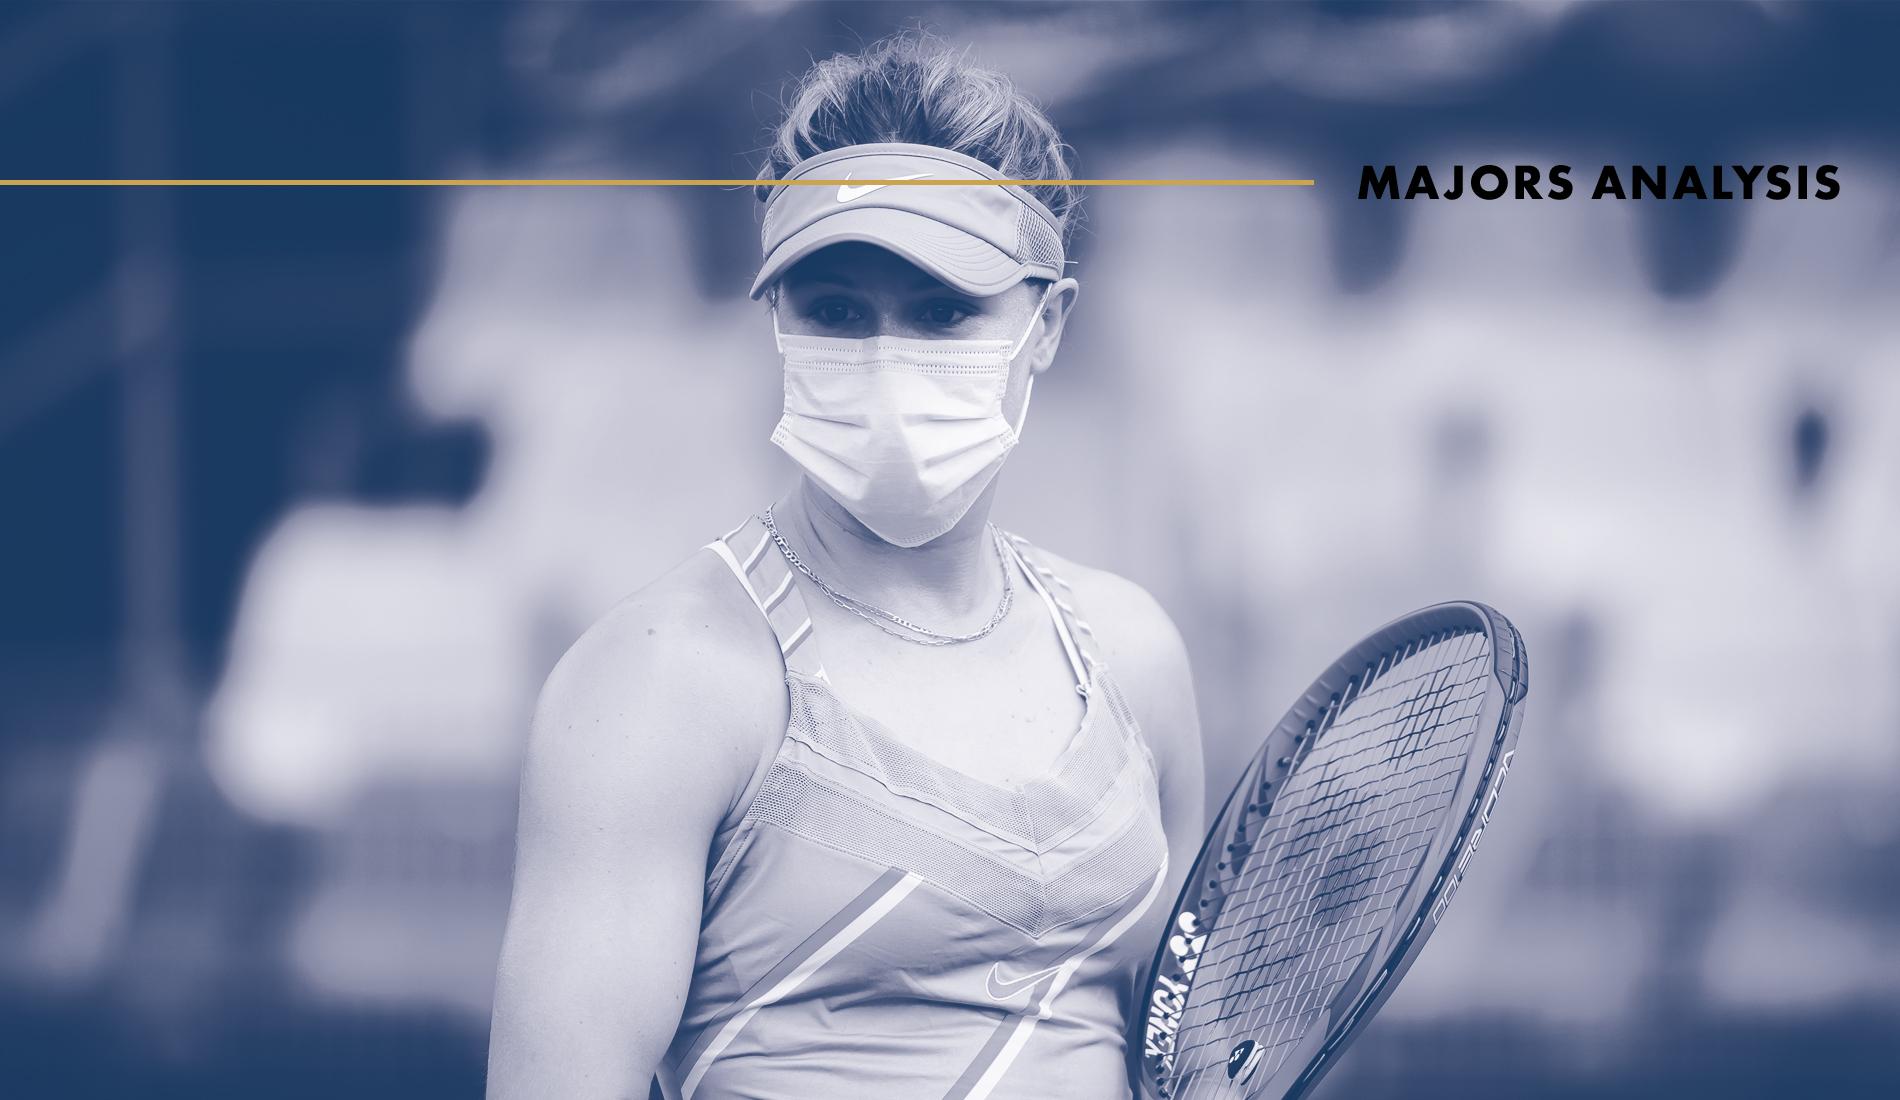 Tennis New Normal : Majors Analysis (Eugenie Bouchard, Prague 2020)